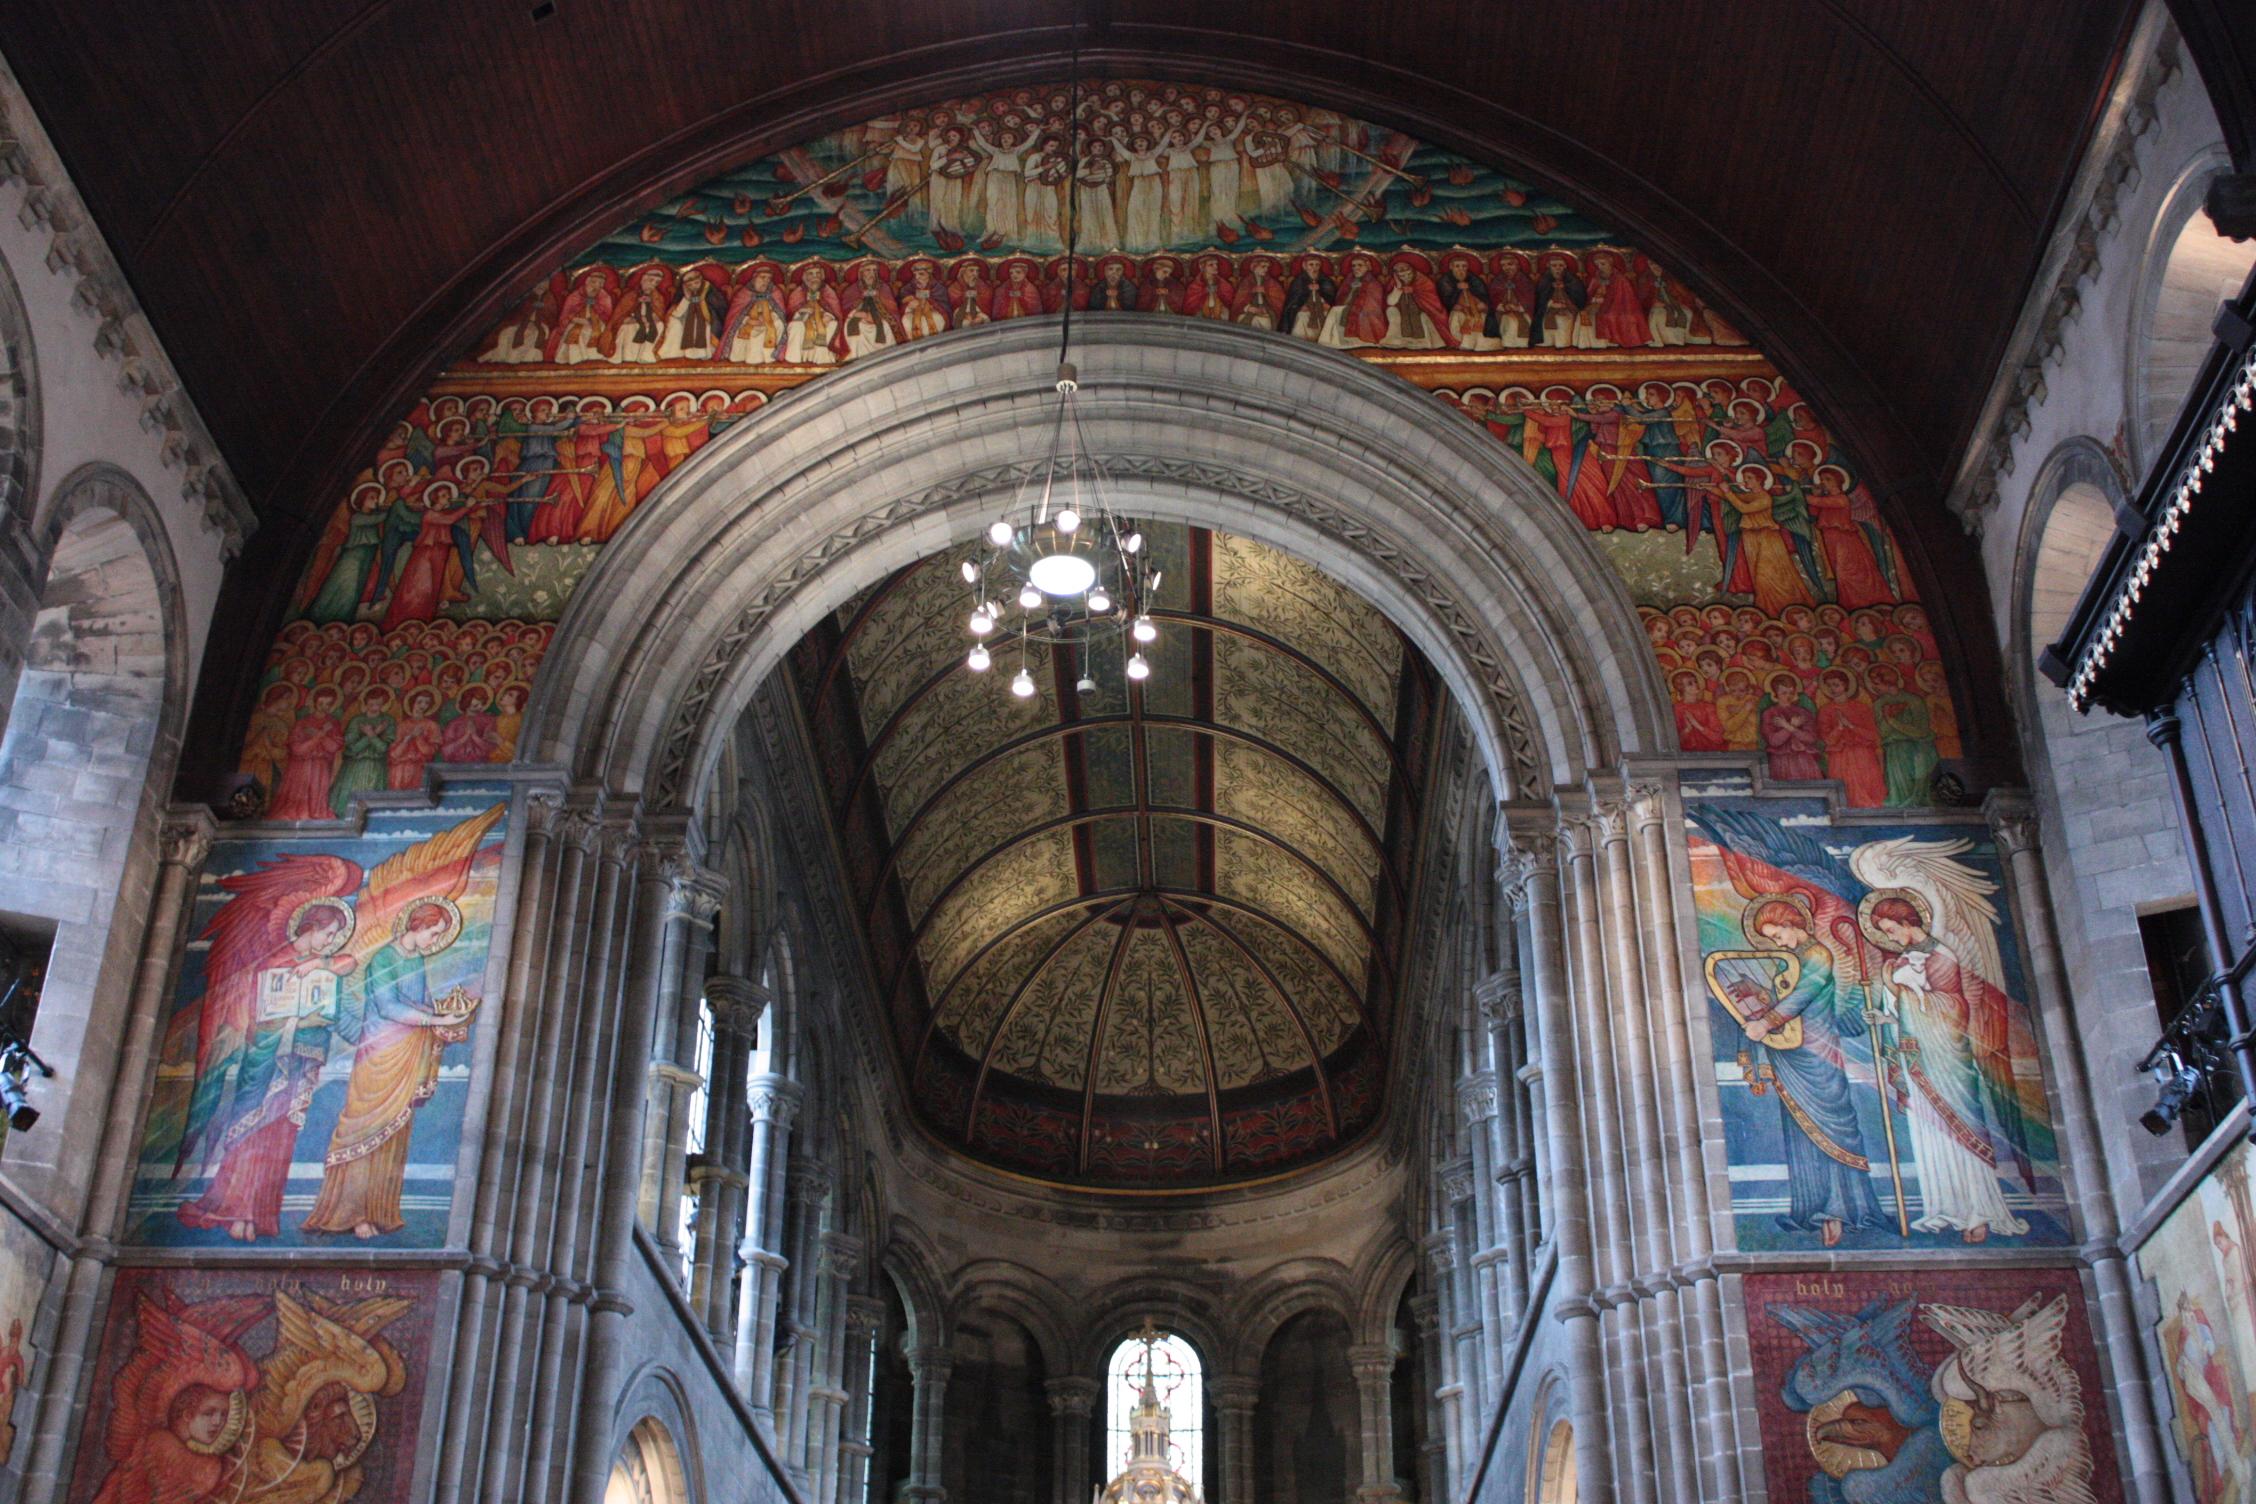 File:Phoebe Traquair's murals, Catholic Apostolic Church, Edinburgh